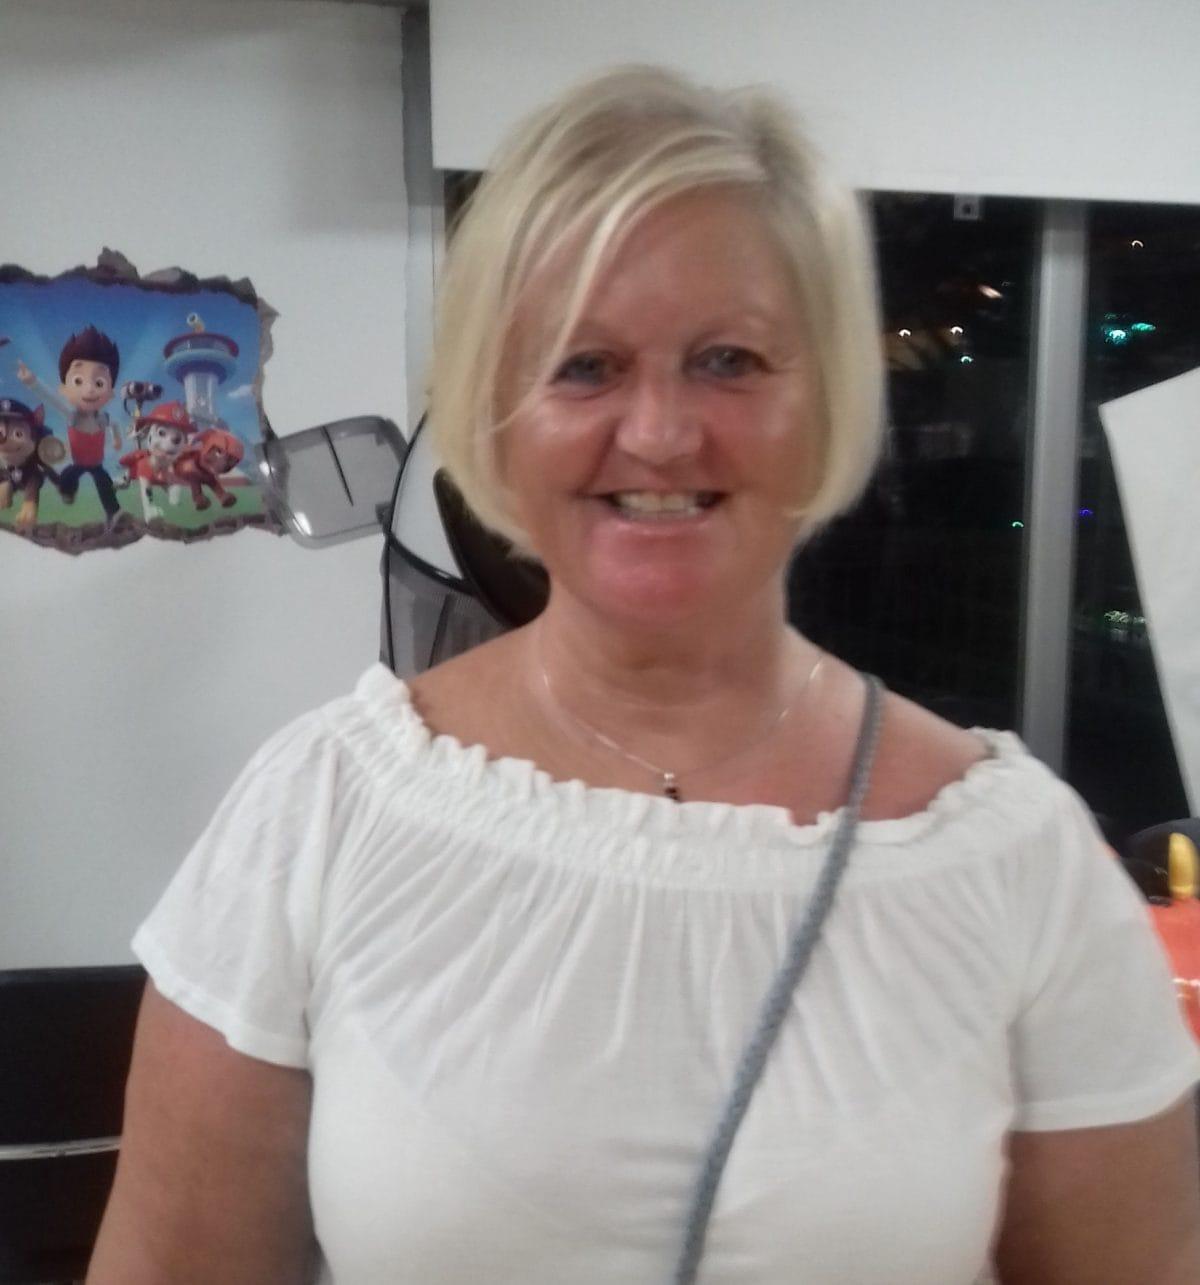 Joyce from KIlmarnock